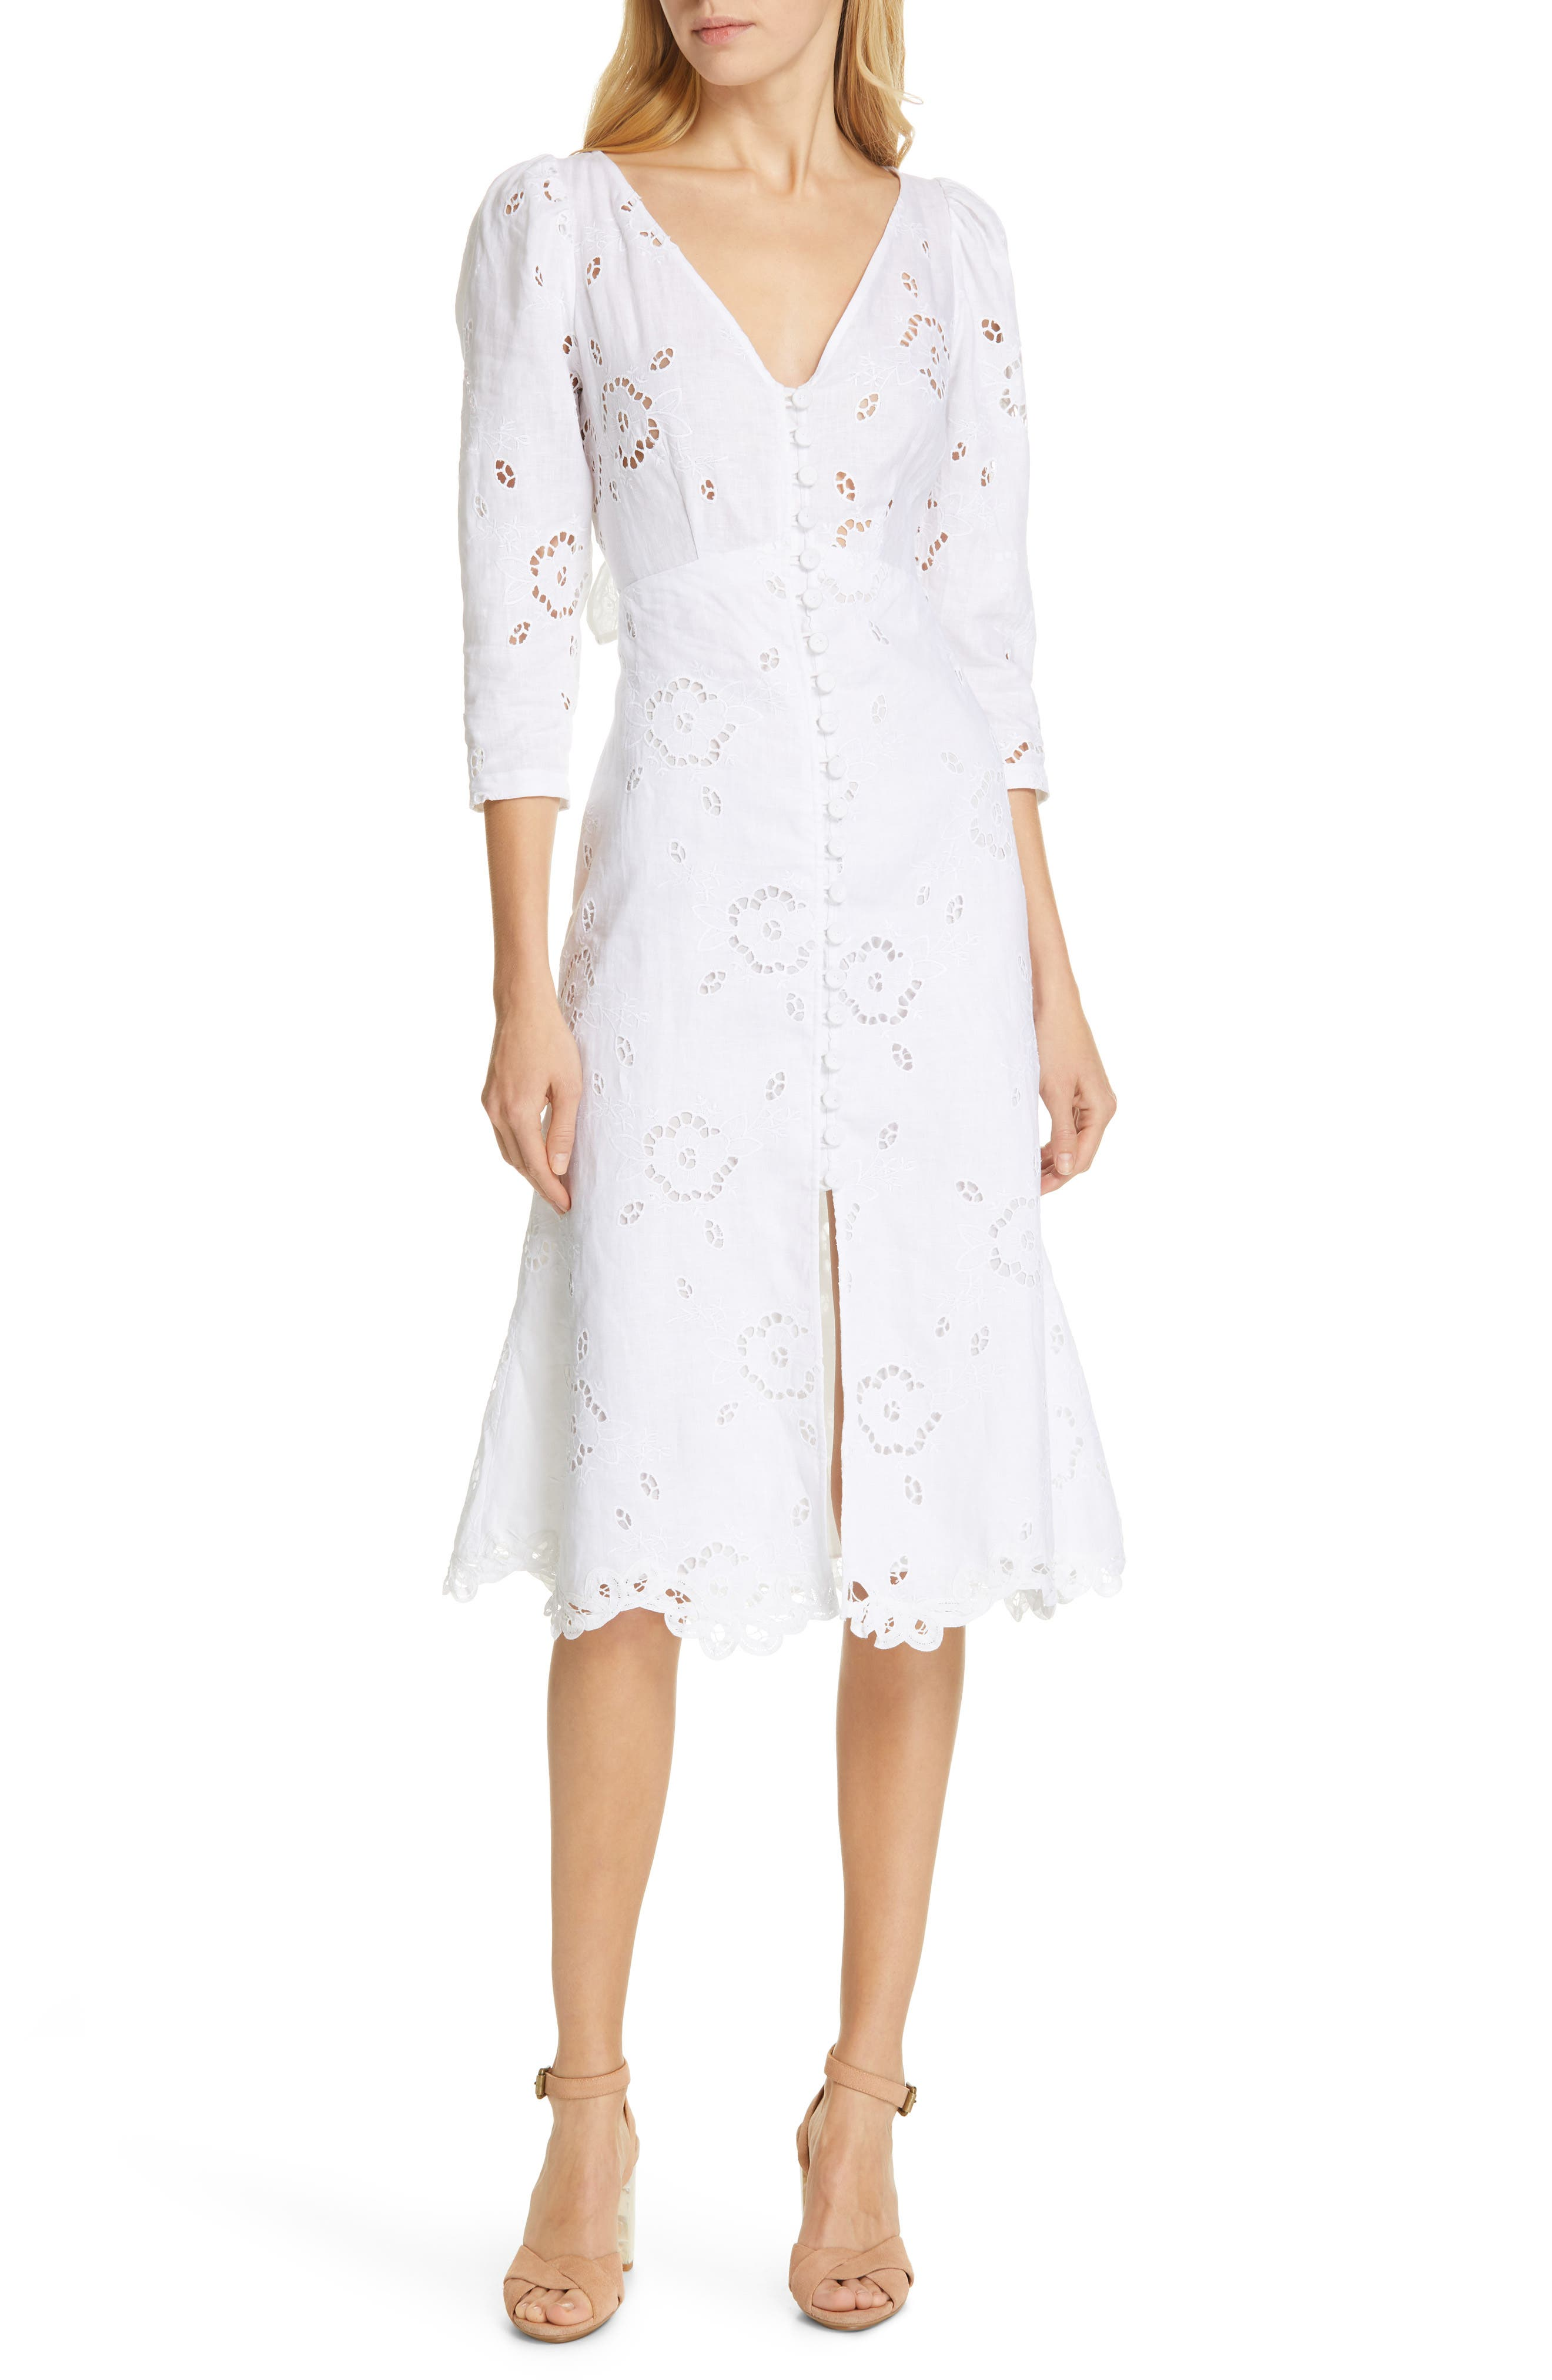 REBECCA TAYLOR Terri Embroidered A-Line Dress, Main, color, MILK